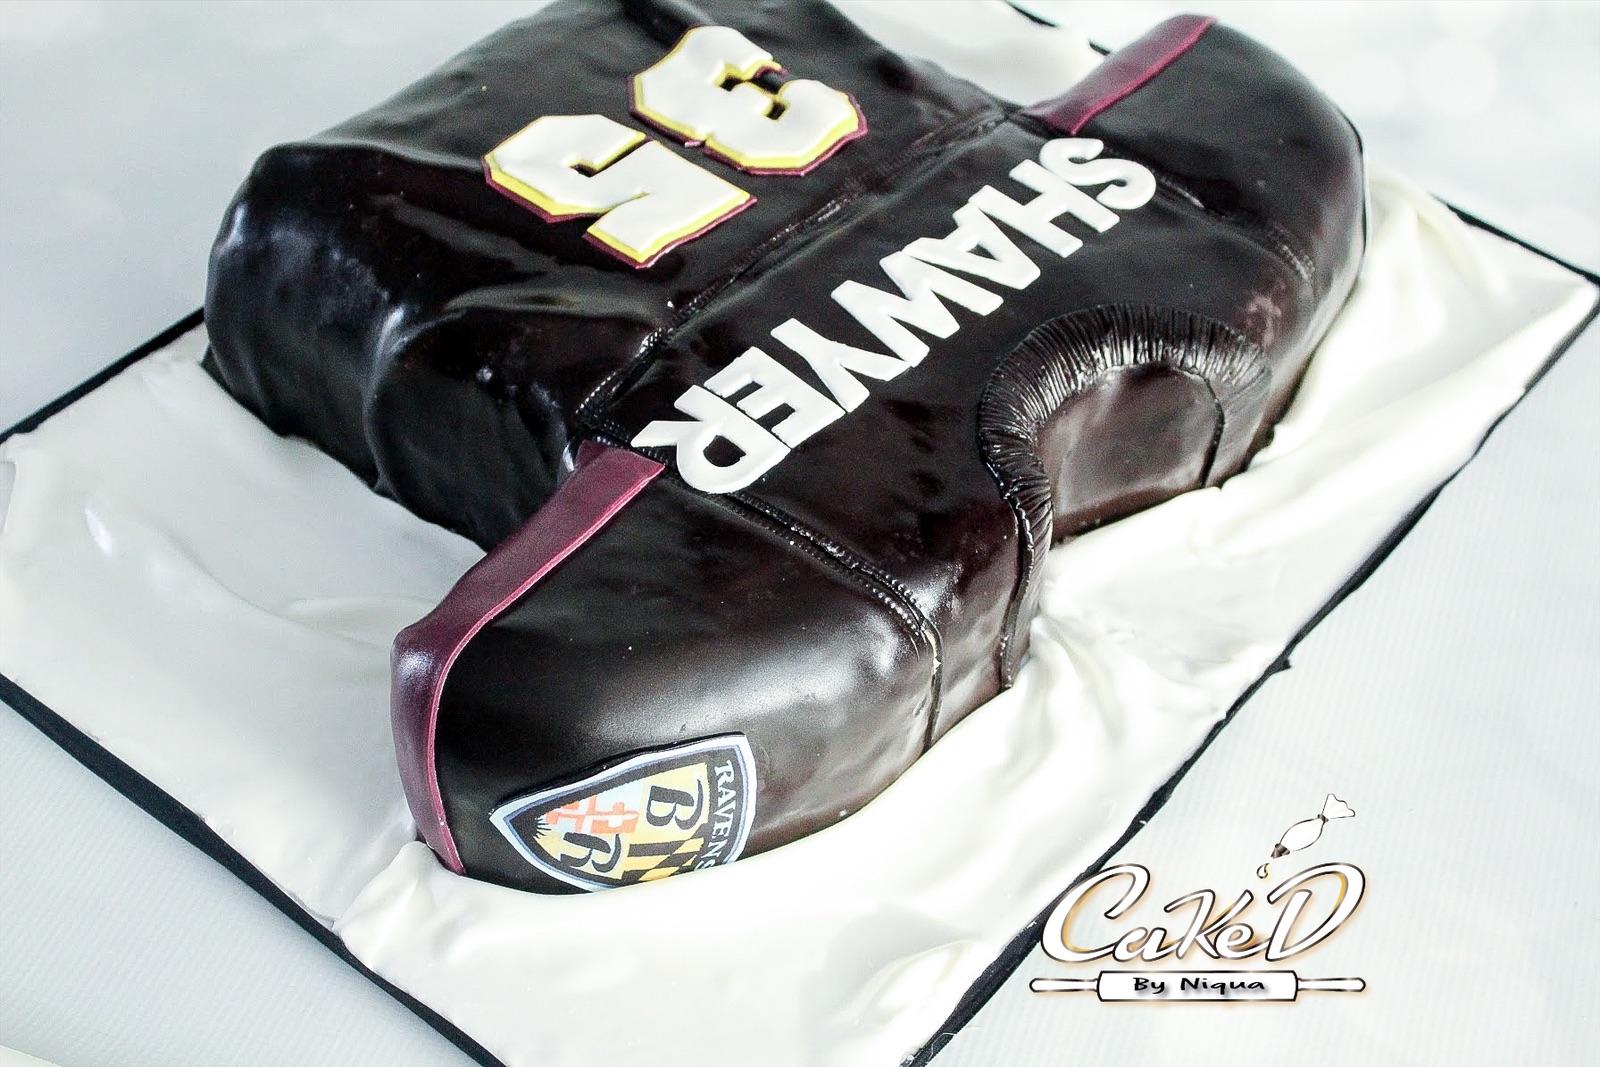 Ravens Football Jersey Cake